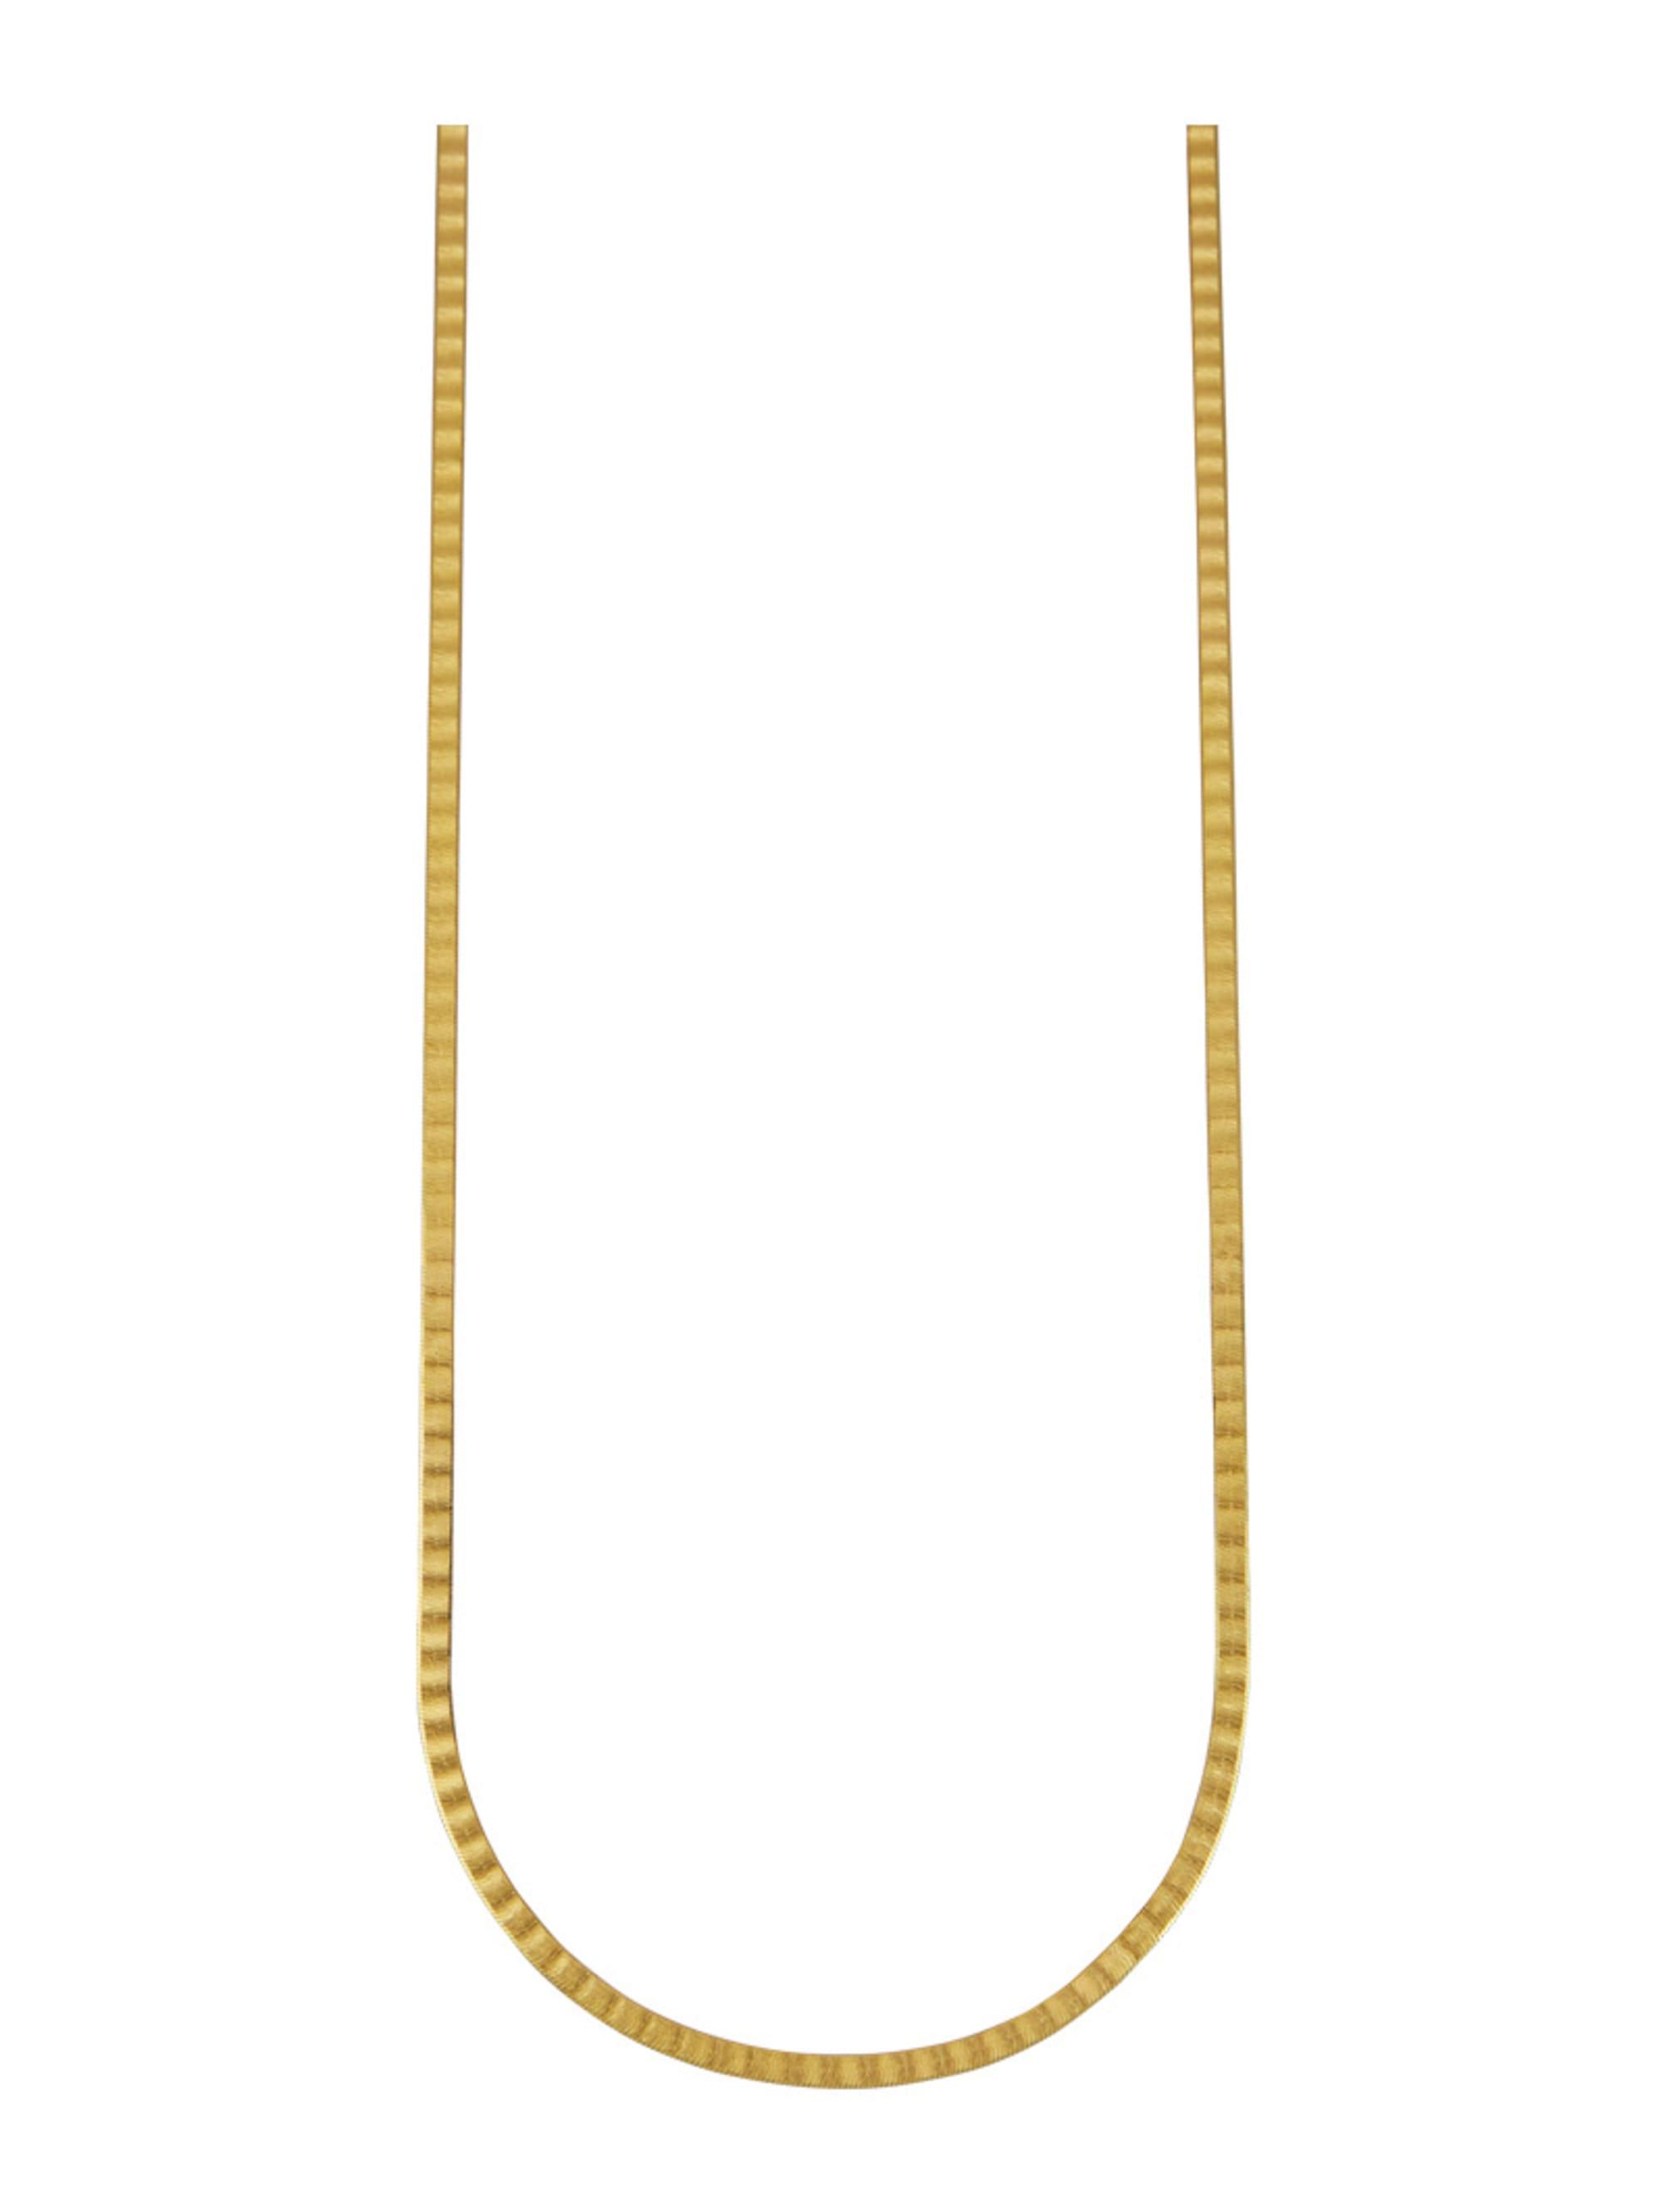 Herringbone-Kette in Massiv Gelbgold 333 pzhS8